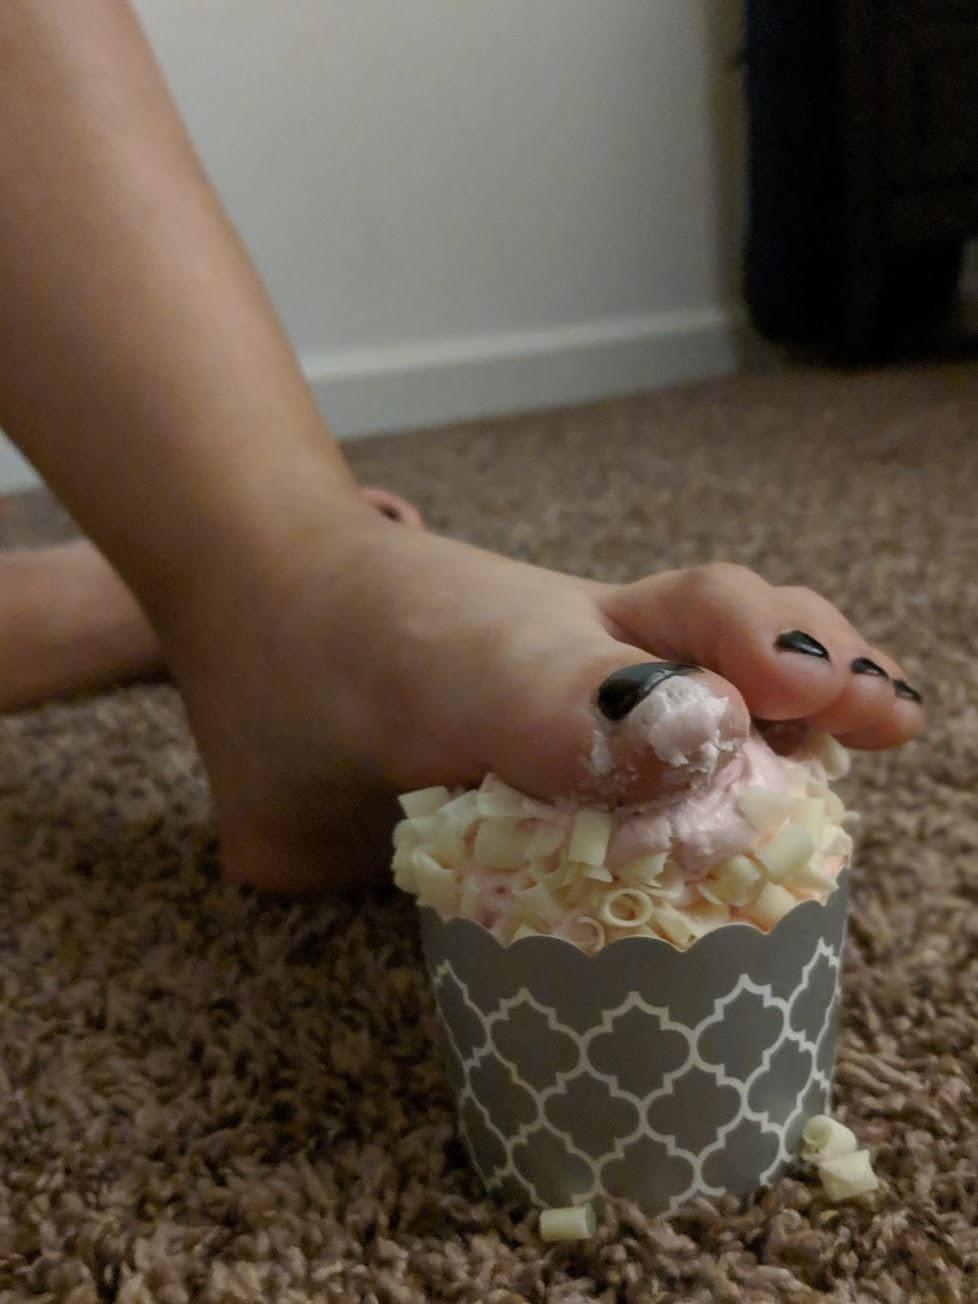 Custom Feet Pictures - 2